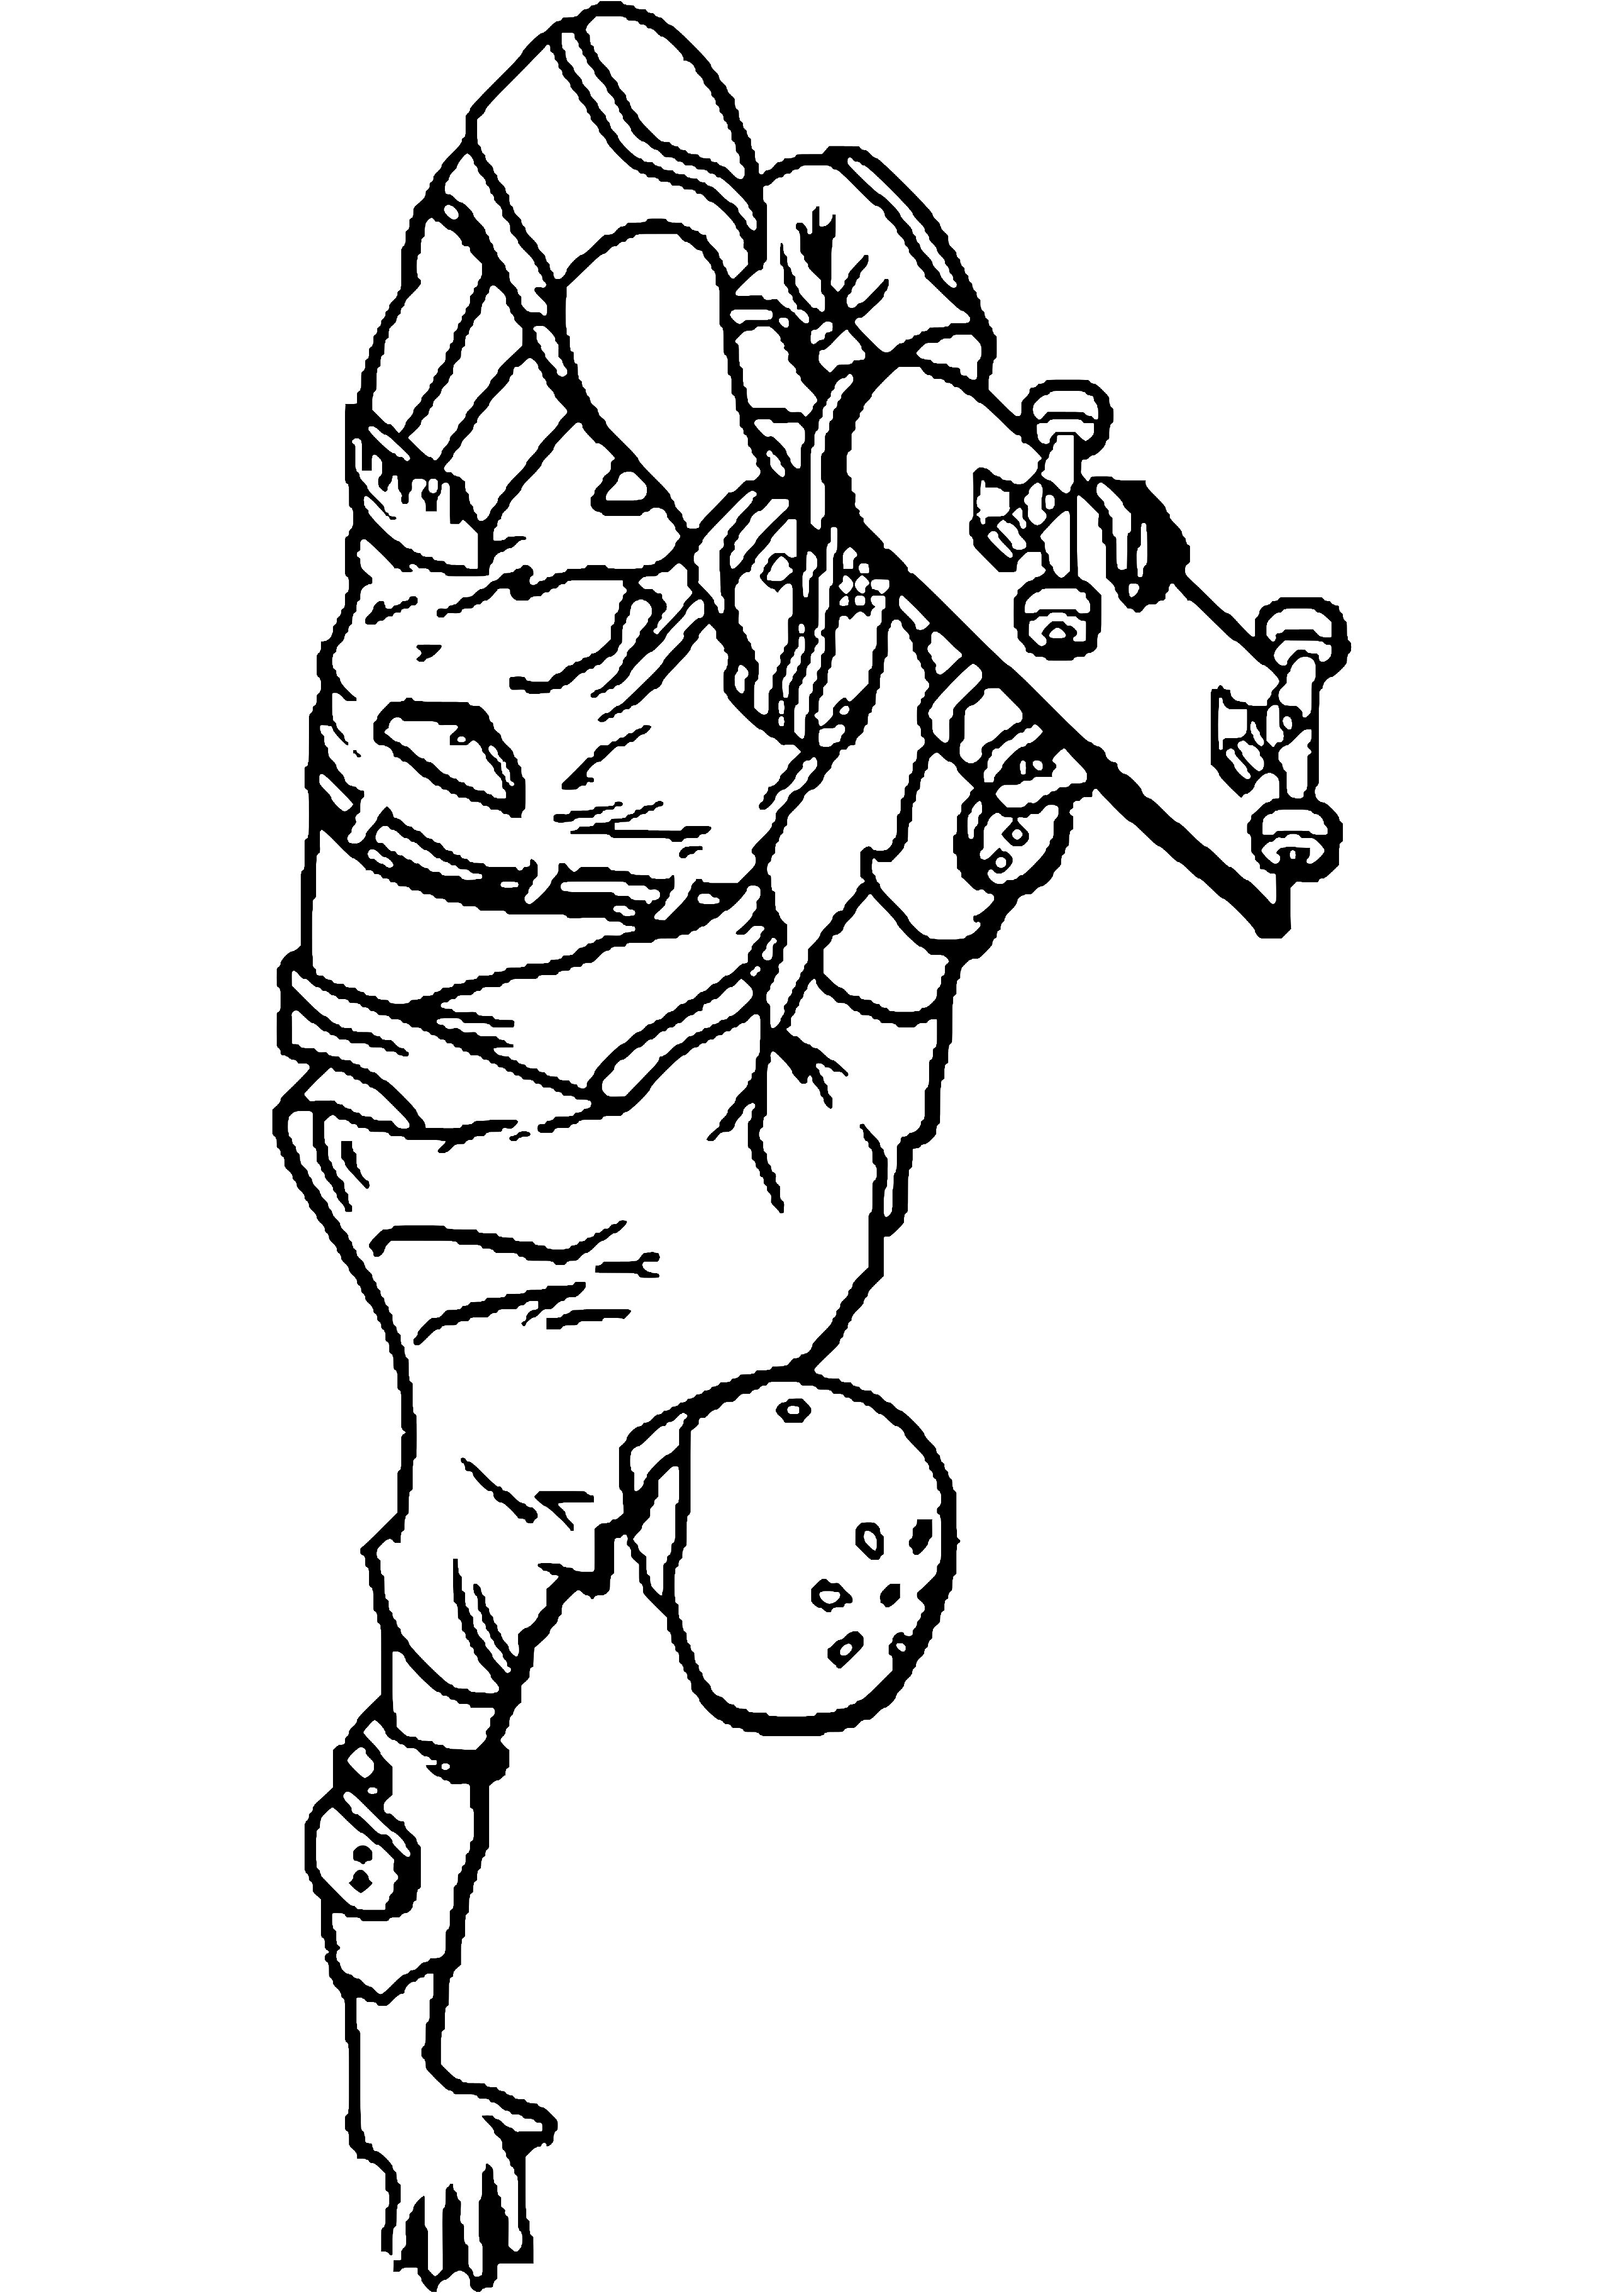 Skateboard (Transporte) - Page 2 - Páginas para colorear